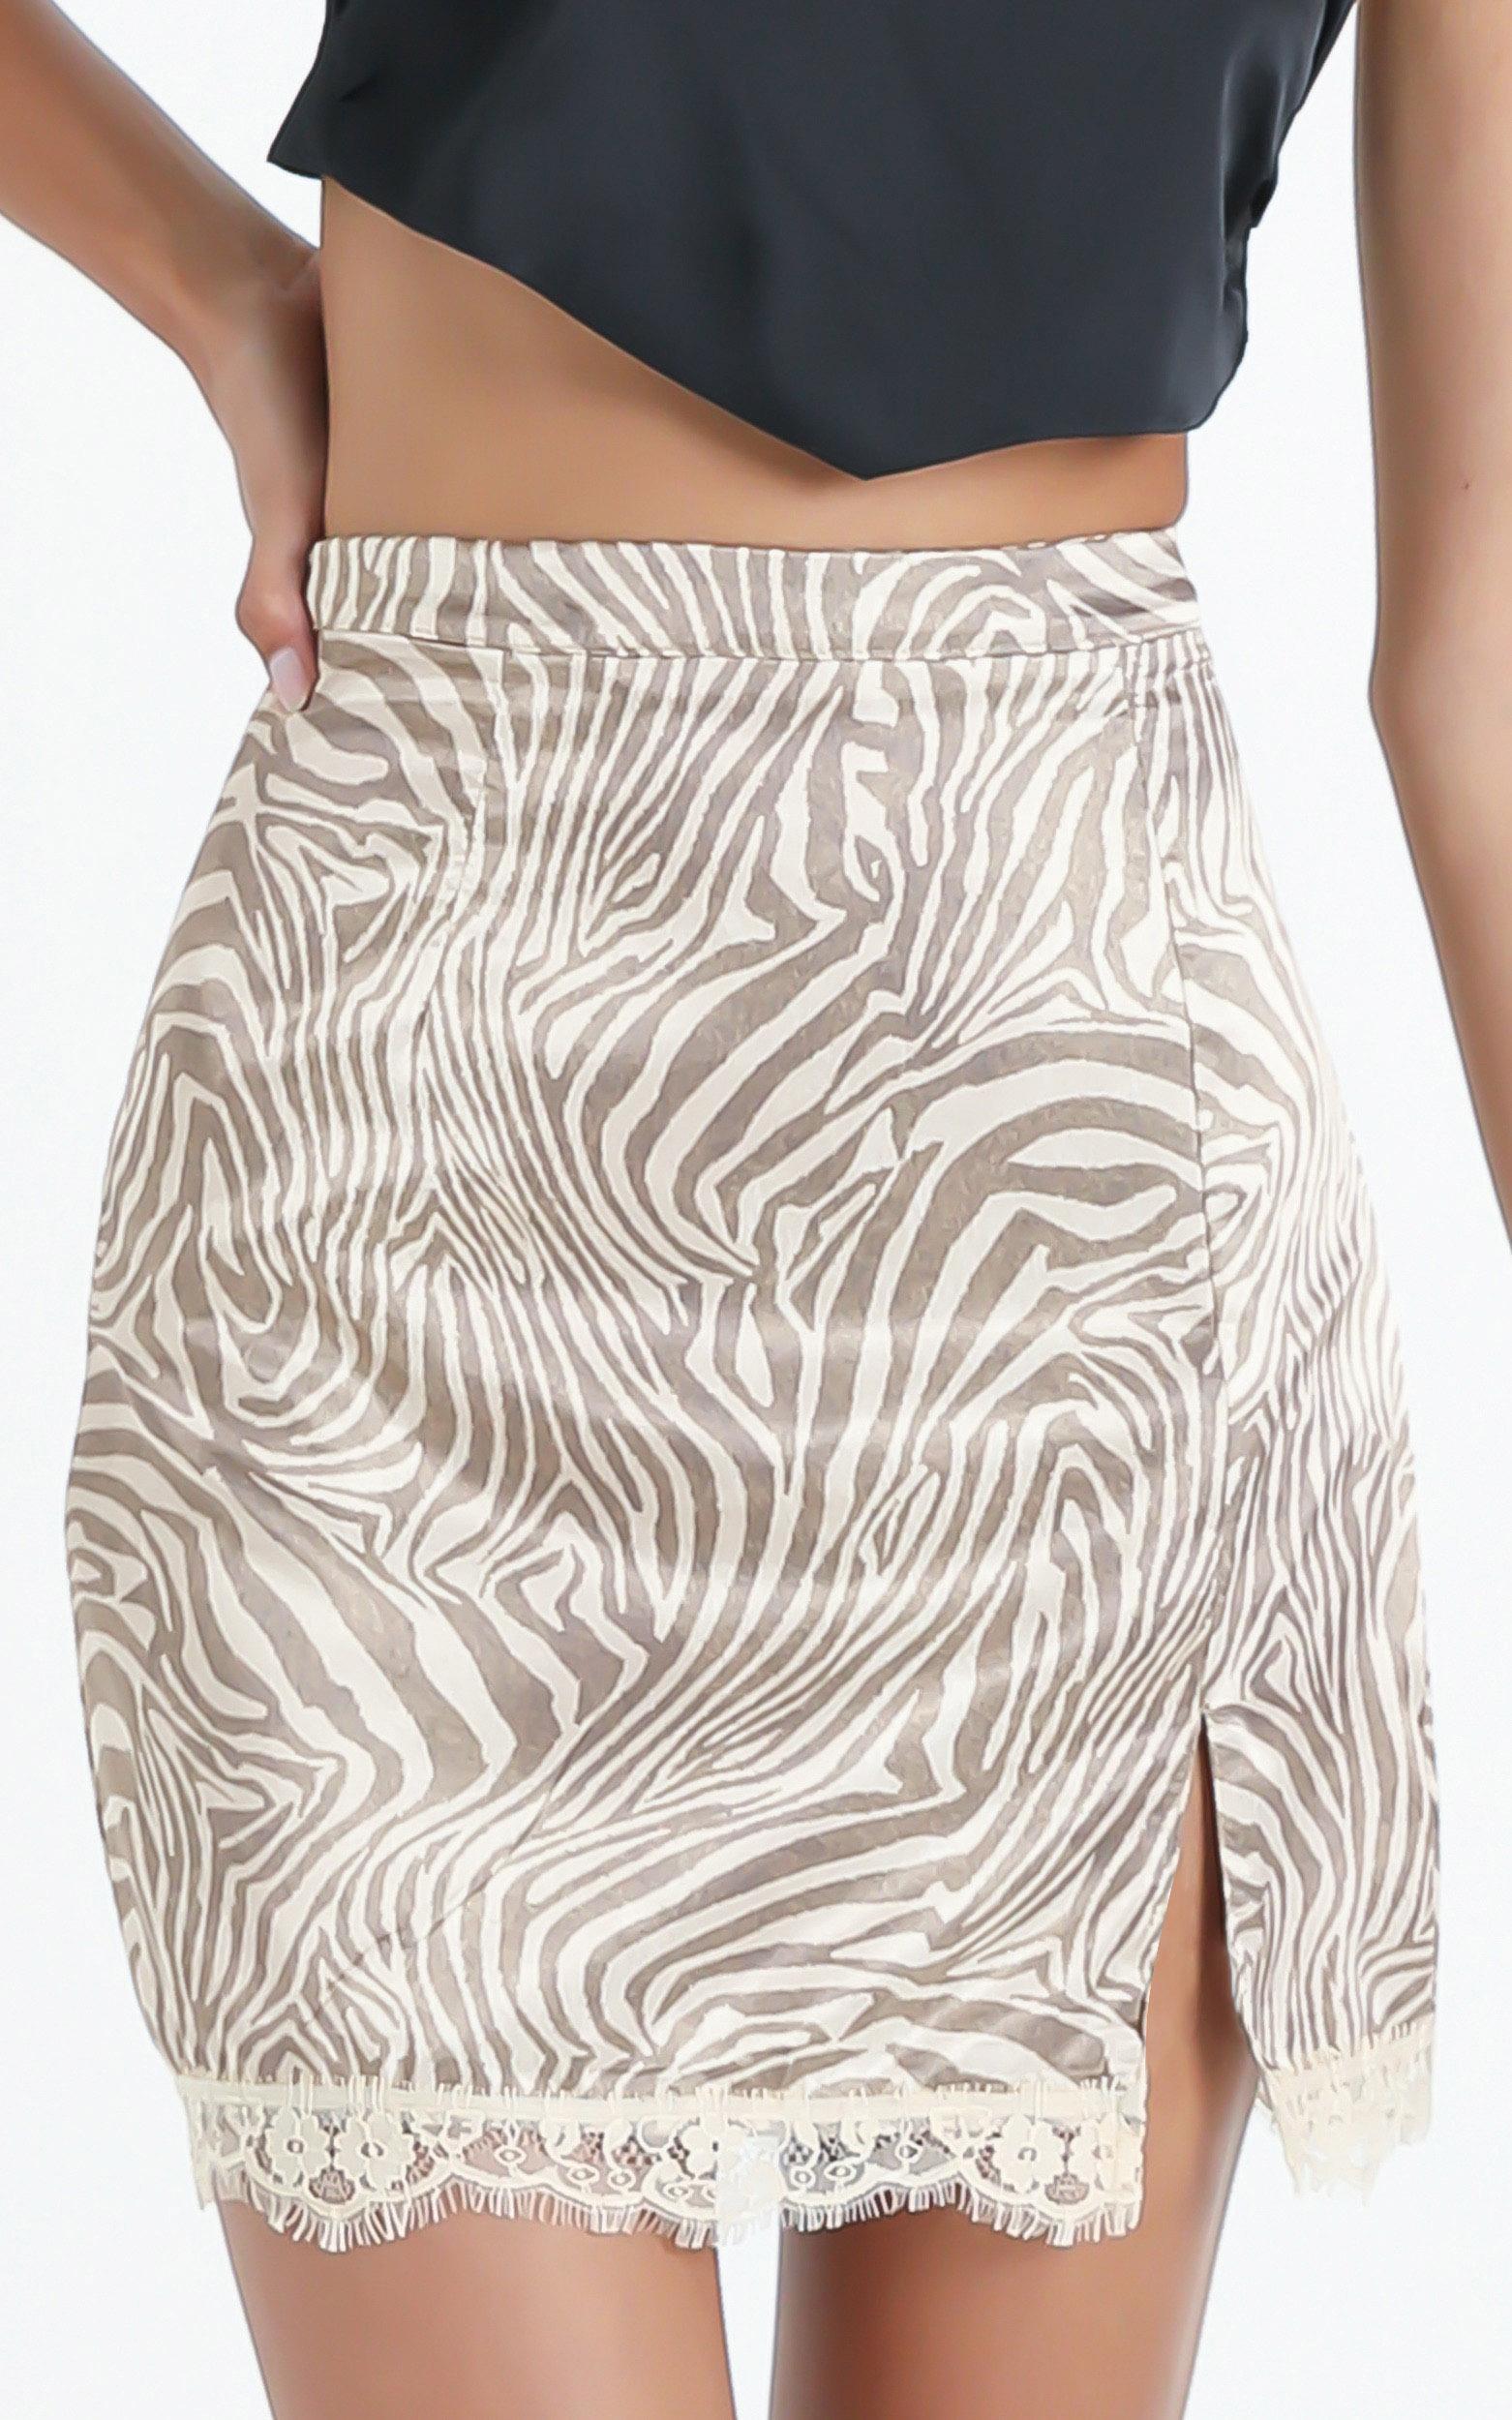 Banba Skirt in Zebra - 6 (XS), Multi, hi-res image number null